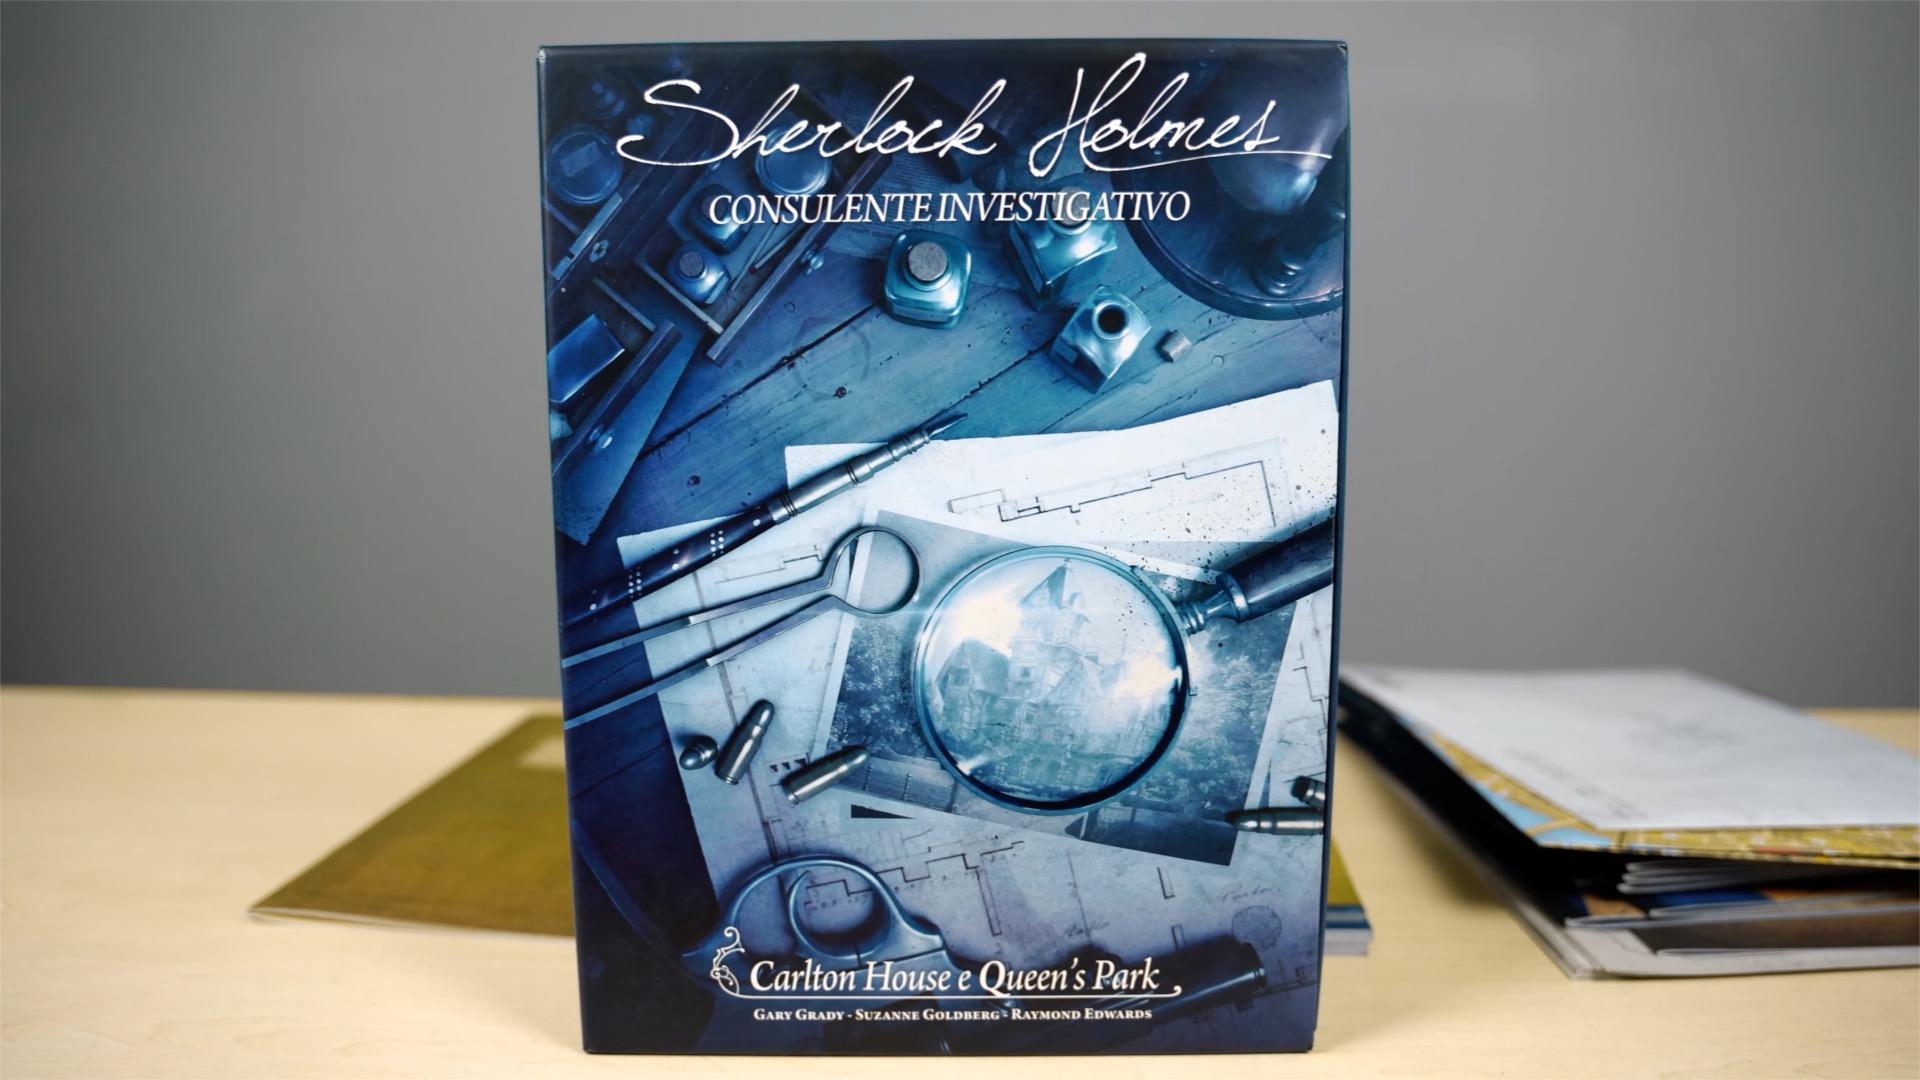 Sherlock Holmes Consulente investigativo Carlton House & Queen's Park